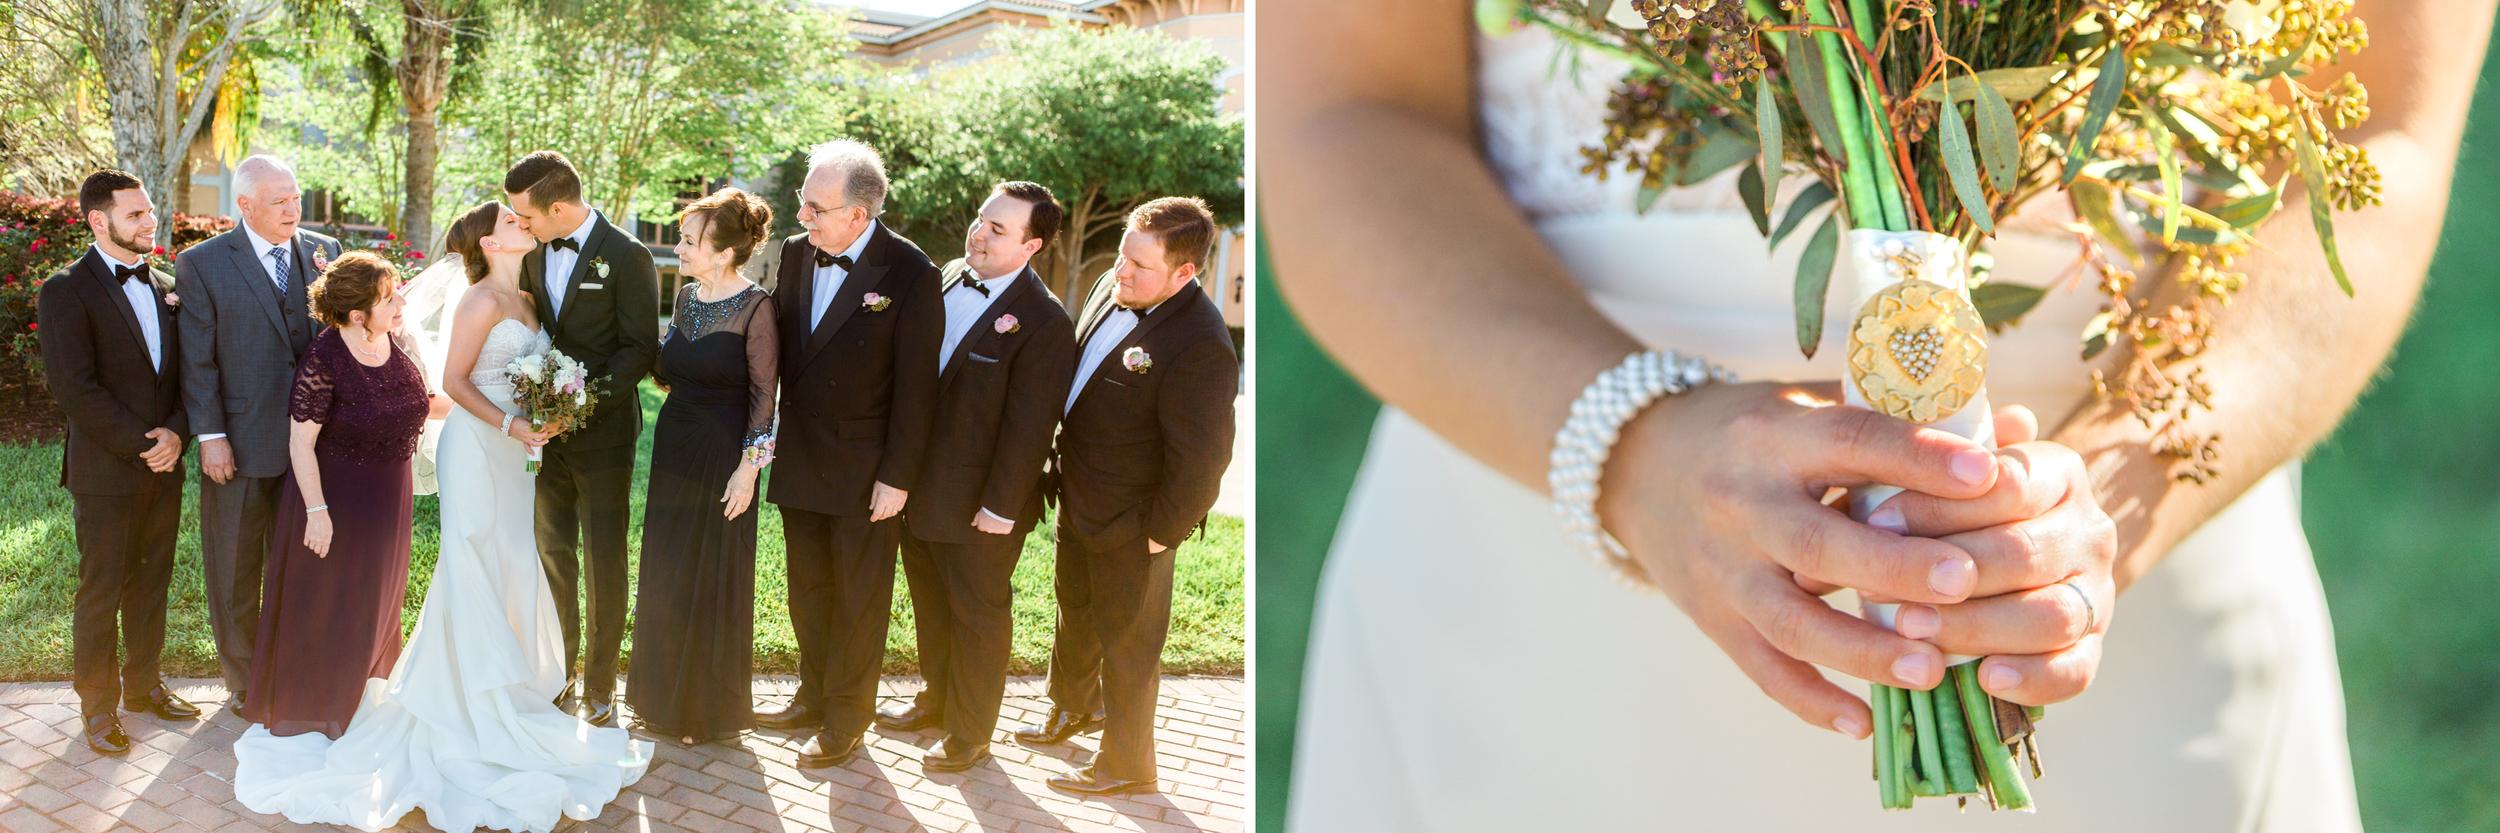 Allie & David Shingle Creek wedding - Family group photo heirloom bouquet charm wedding gown diptych mastin.jpg